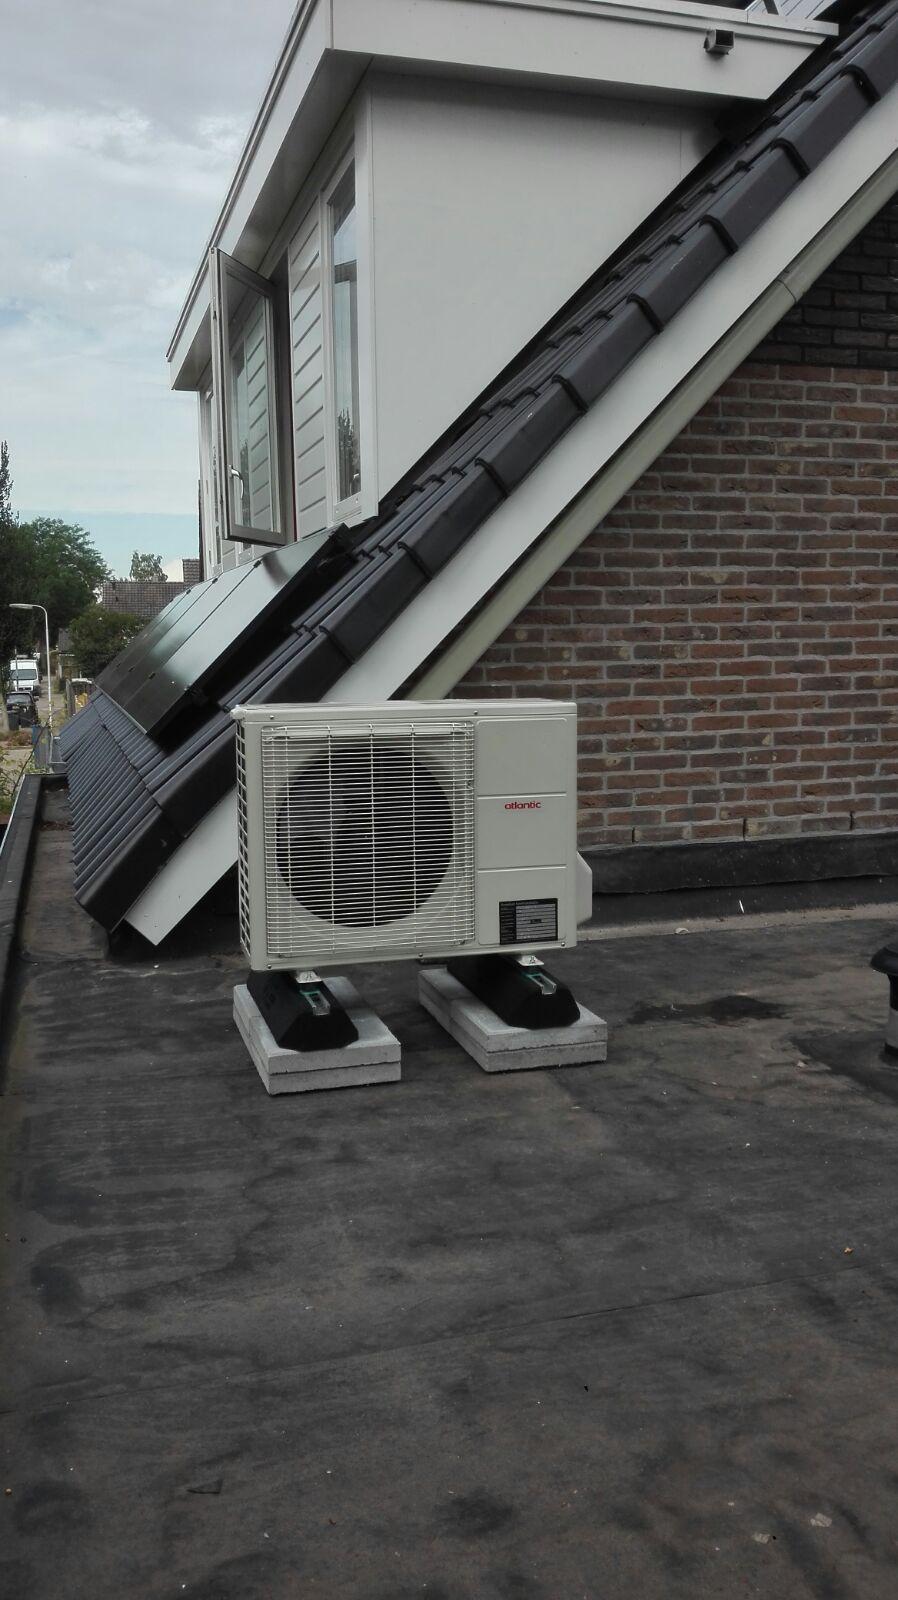 Besparing warmtepomp | Een slimme investering